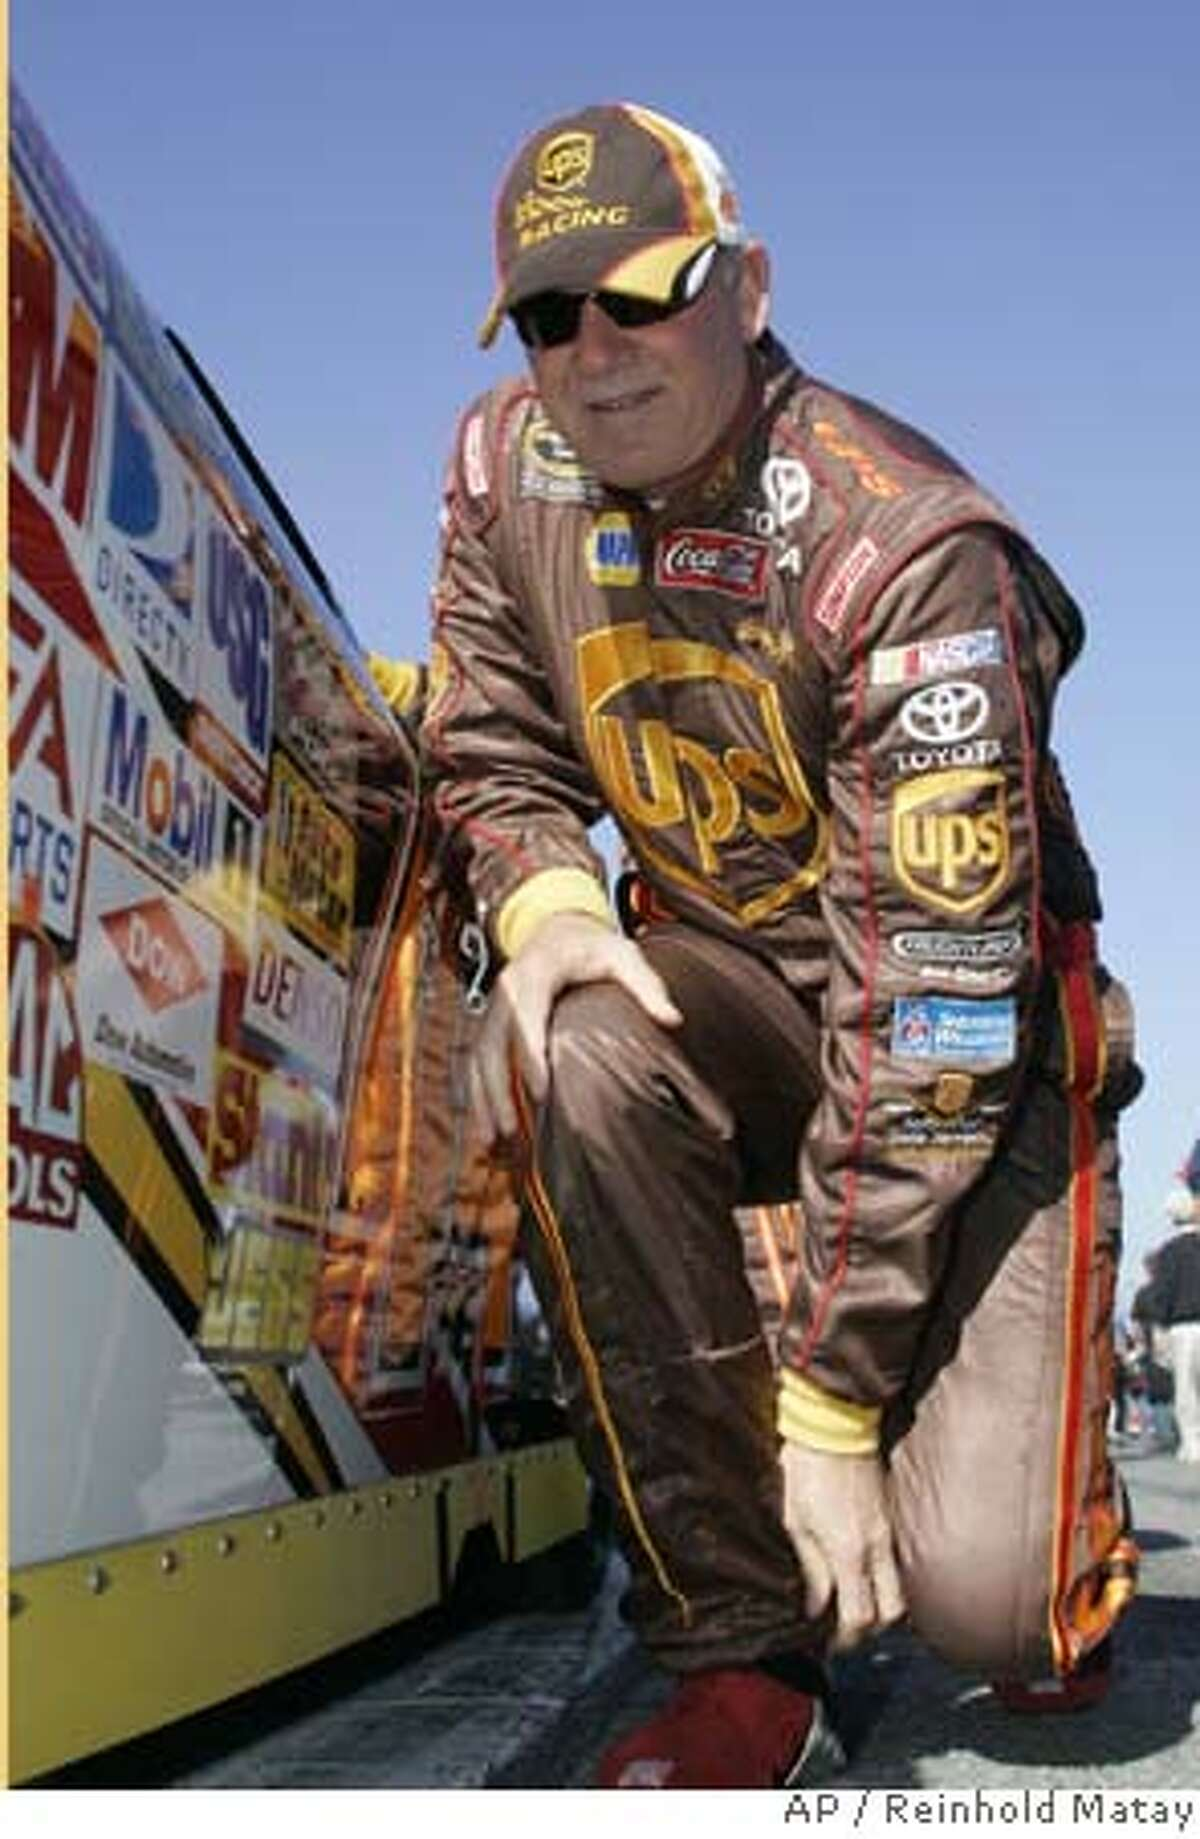 NASCAR driver Dale Jarrett prepares to get in his car at Daytona International Speedway in Daytona Beach, Fla., Thursday, Feb. 14, 2008. (AP Photo/Reinhold Matay) EFE OUT